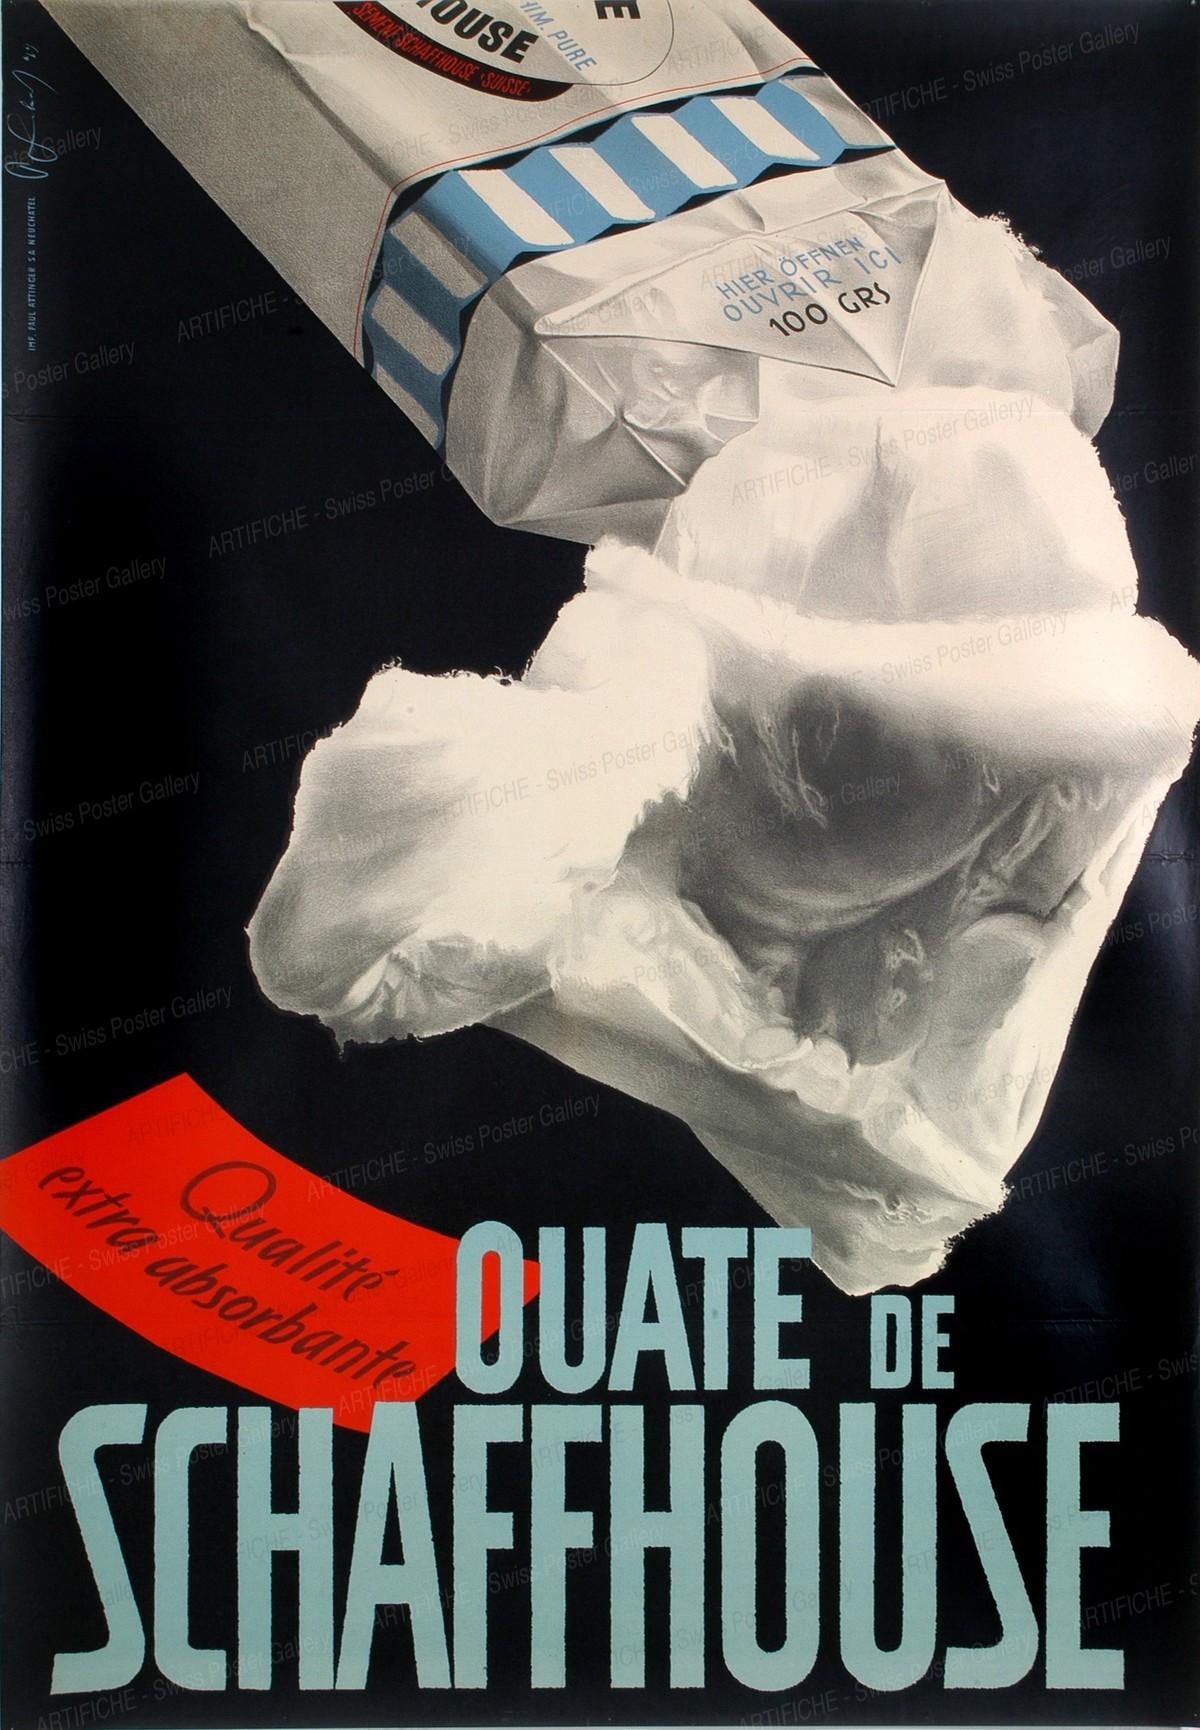 OUATE DE SCHAFFHOUSE, Pierre Gauchat